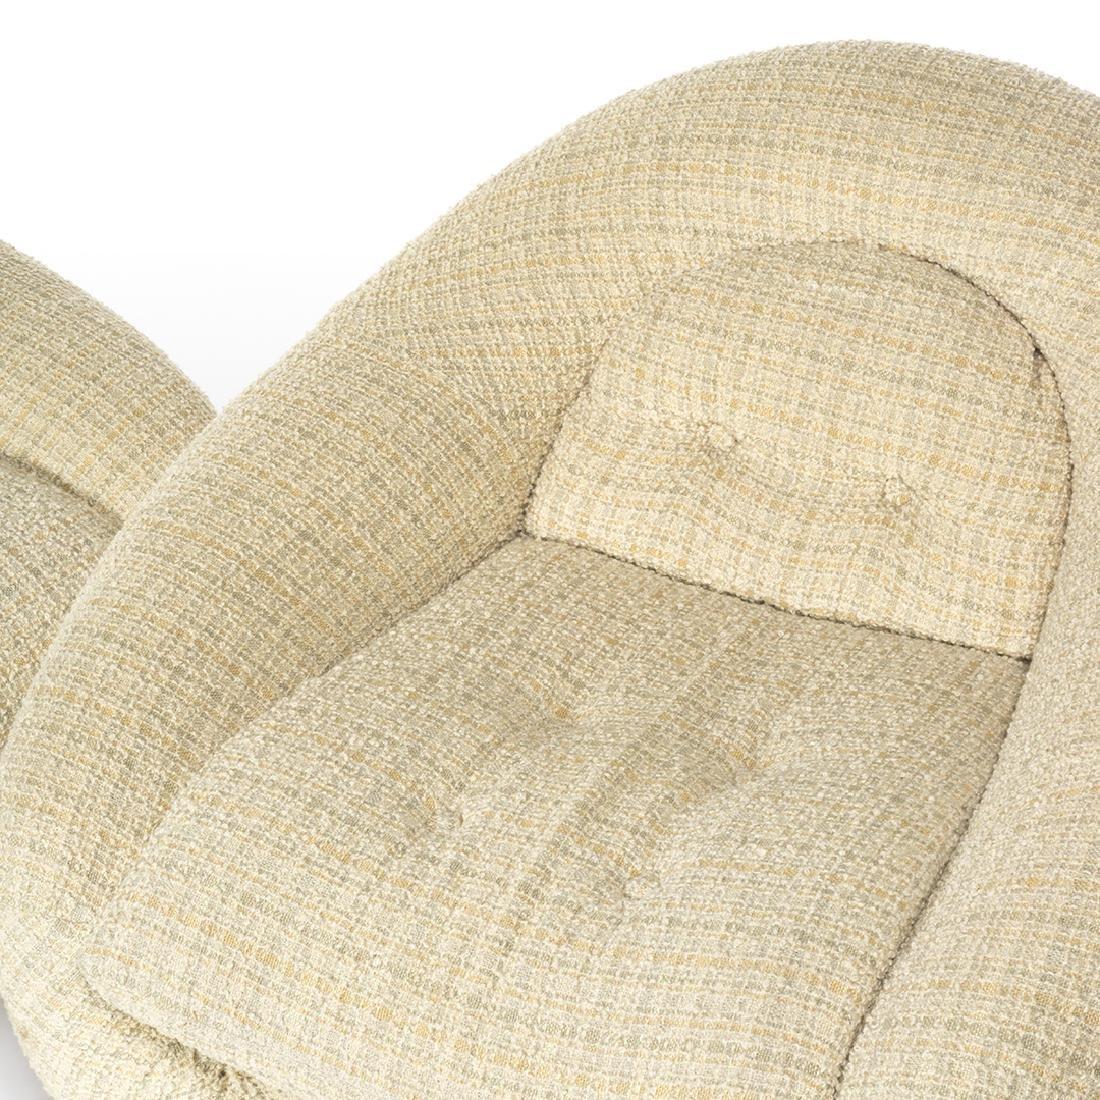 R. Huber Lounge Chairs (2) - 4